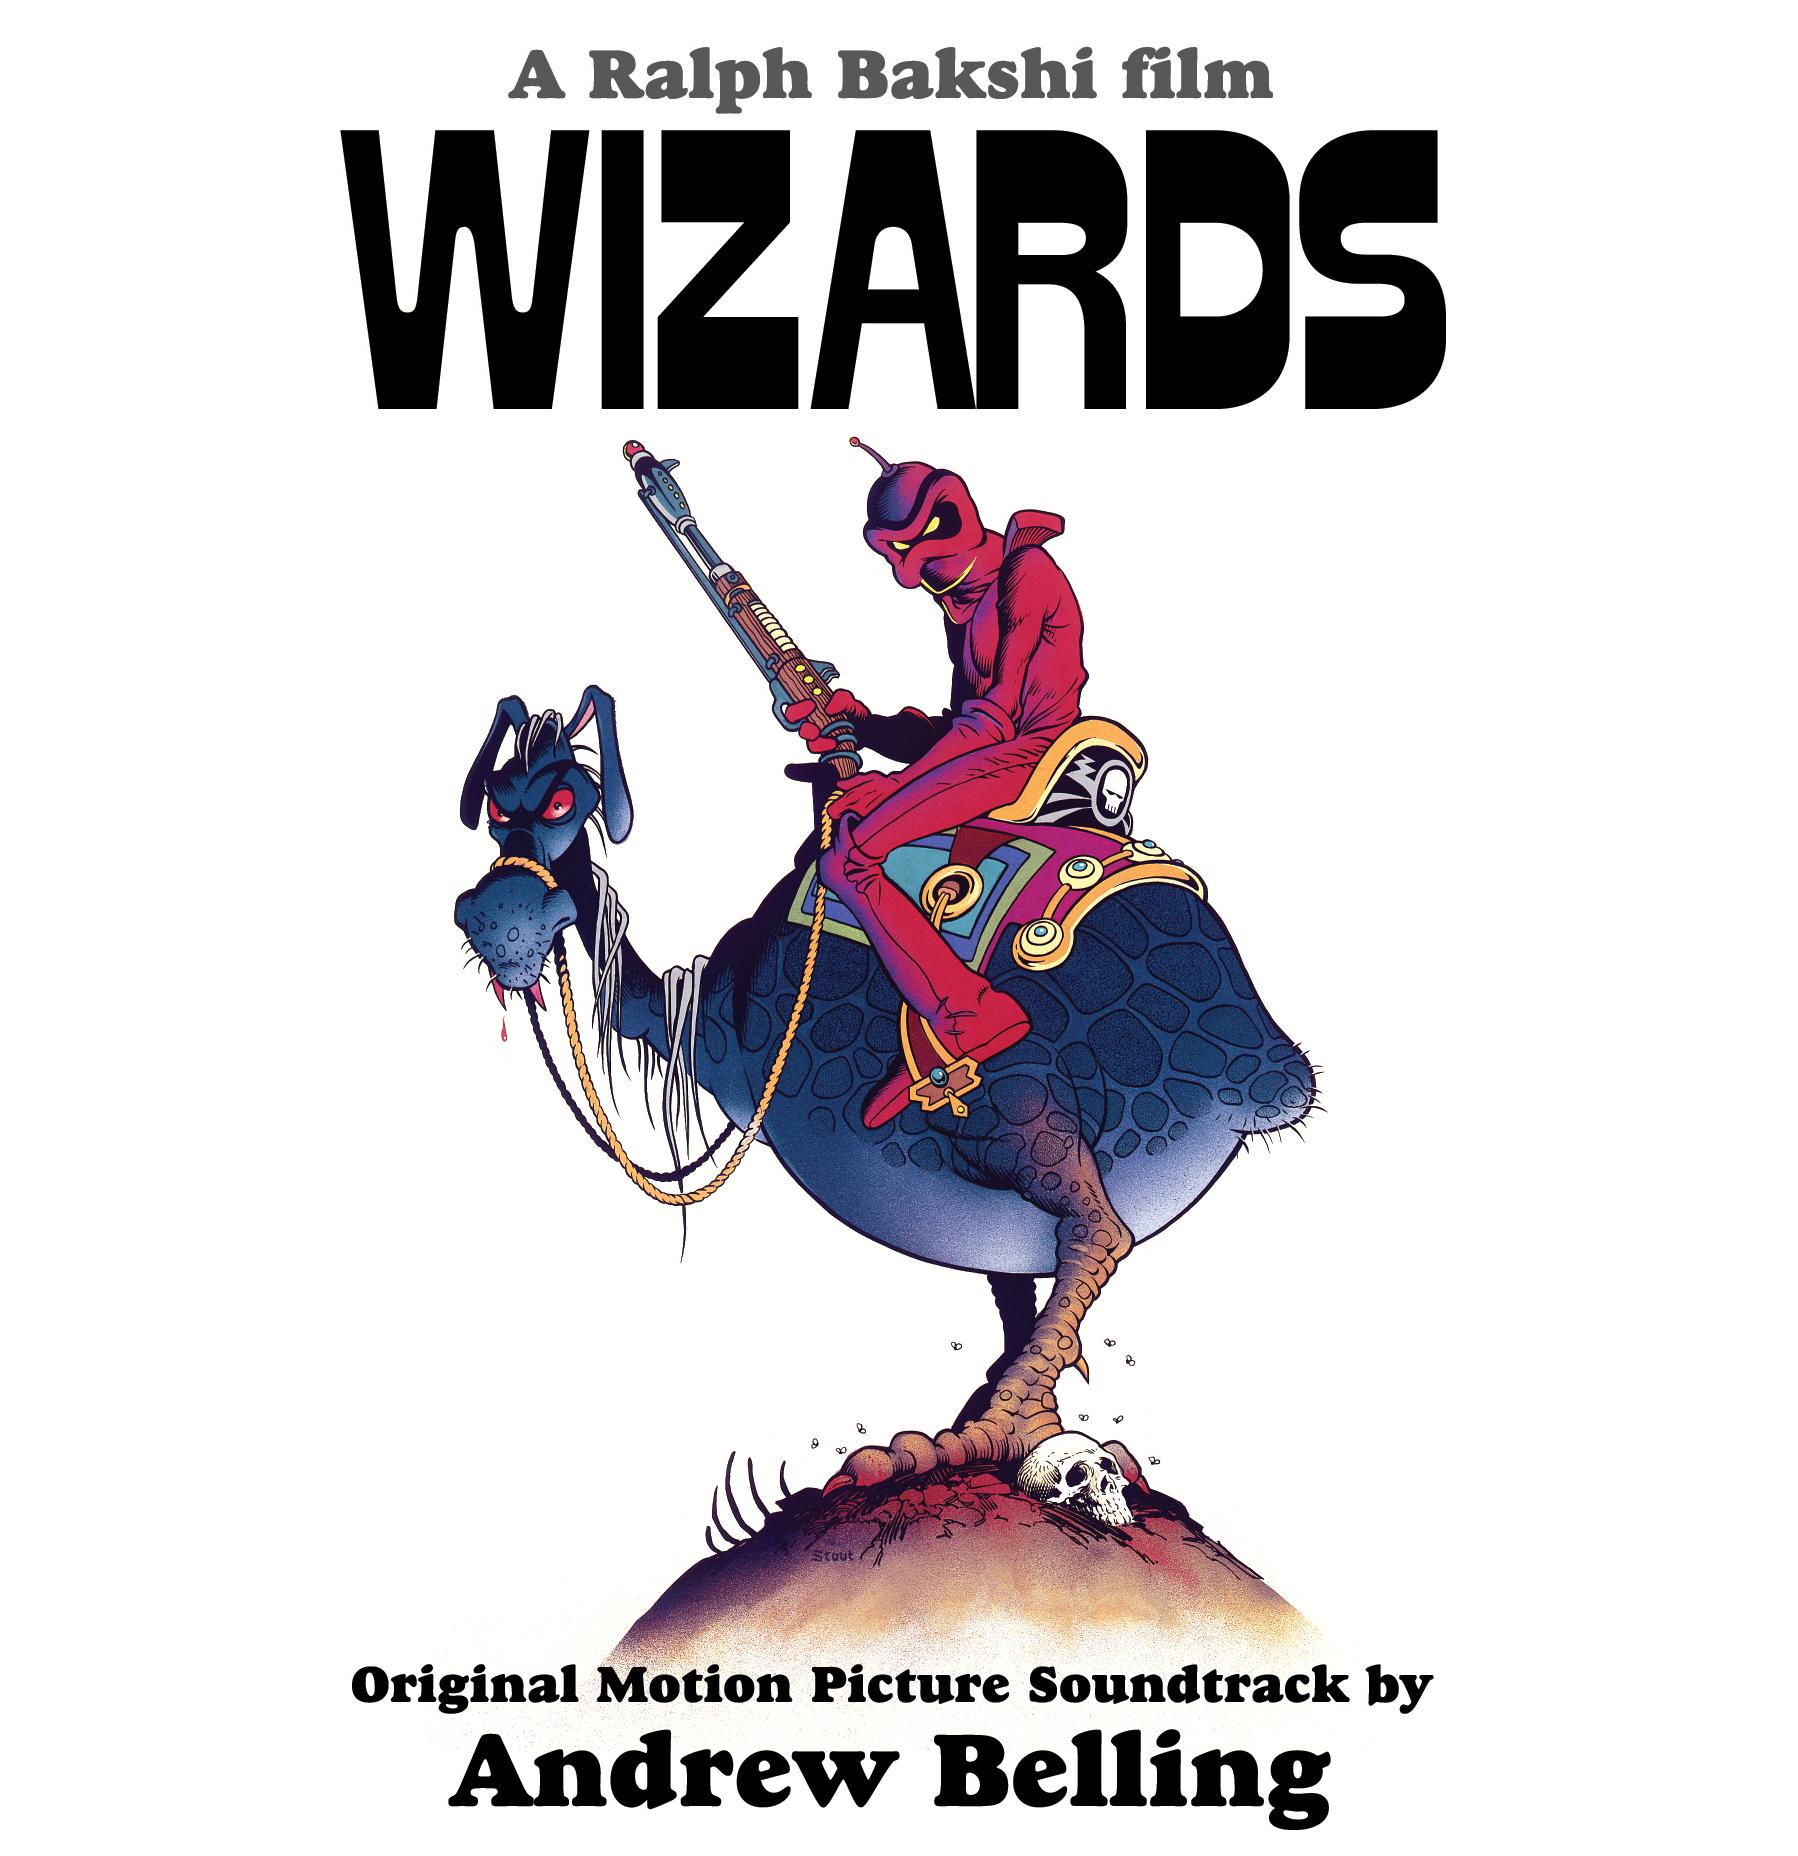 Wizards 1977 Original Soundtrack Light In The Attic